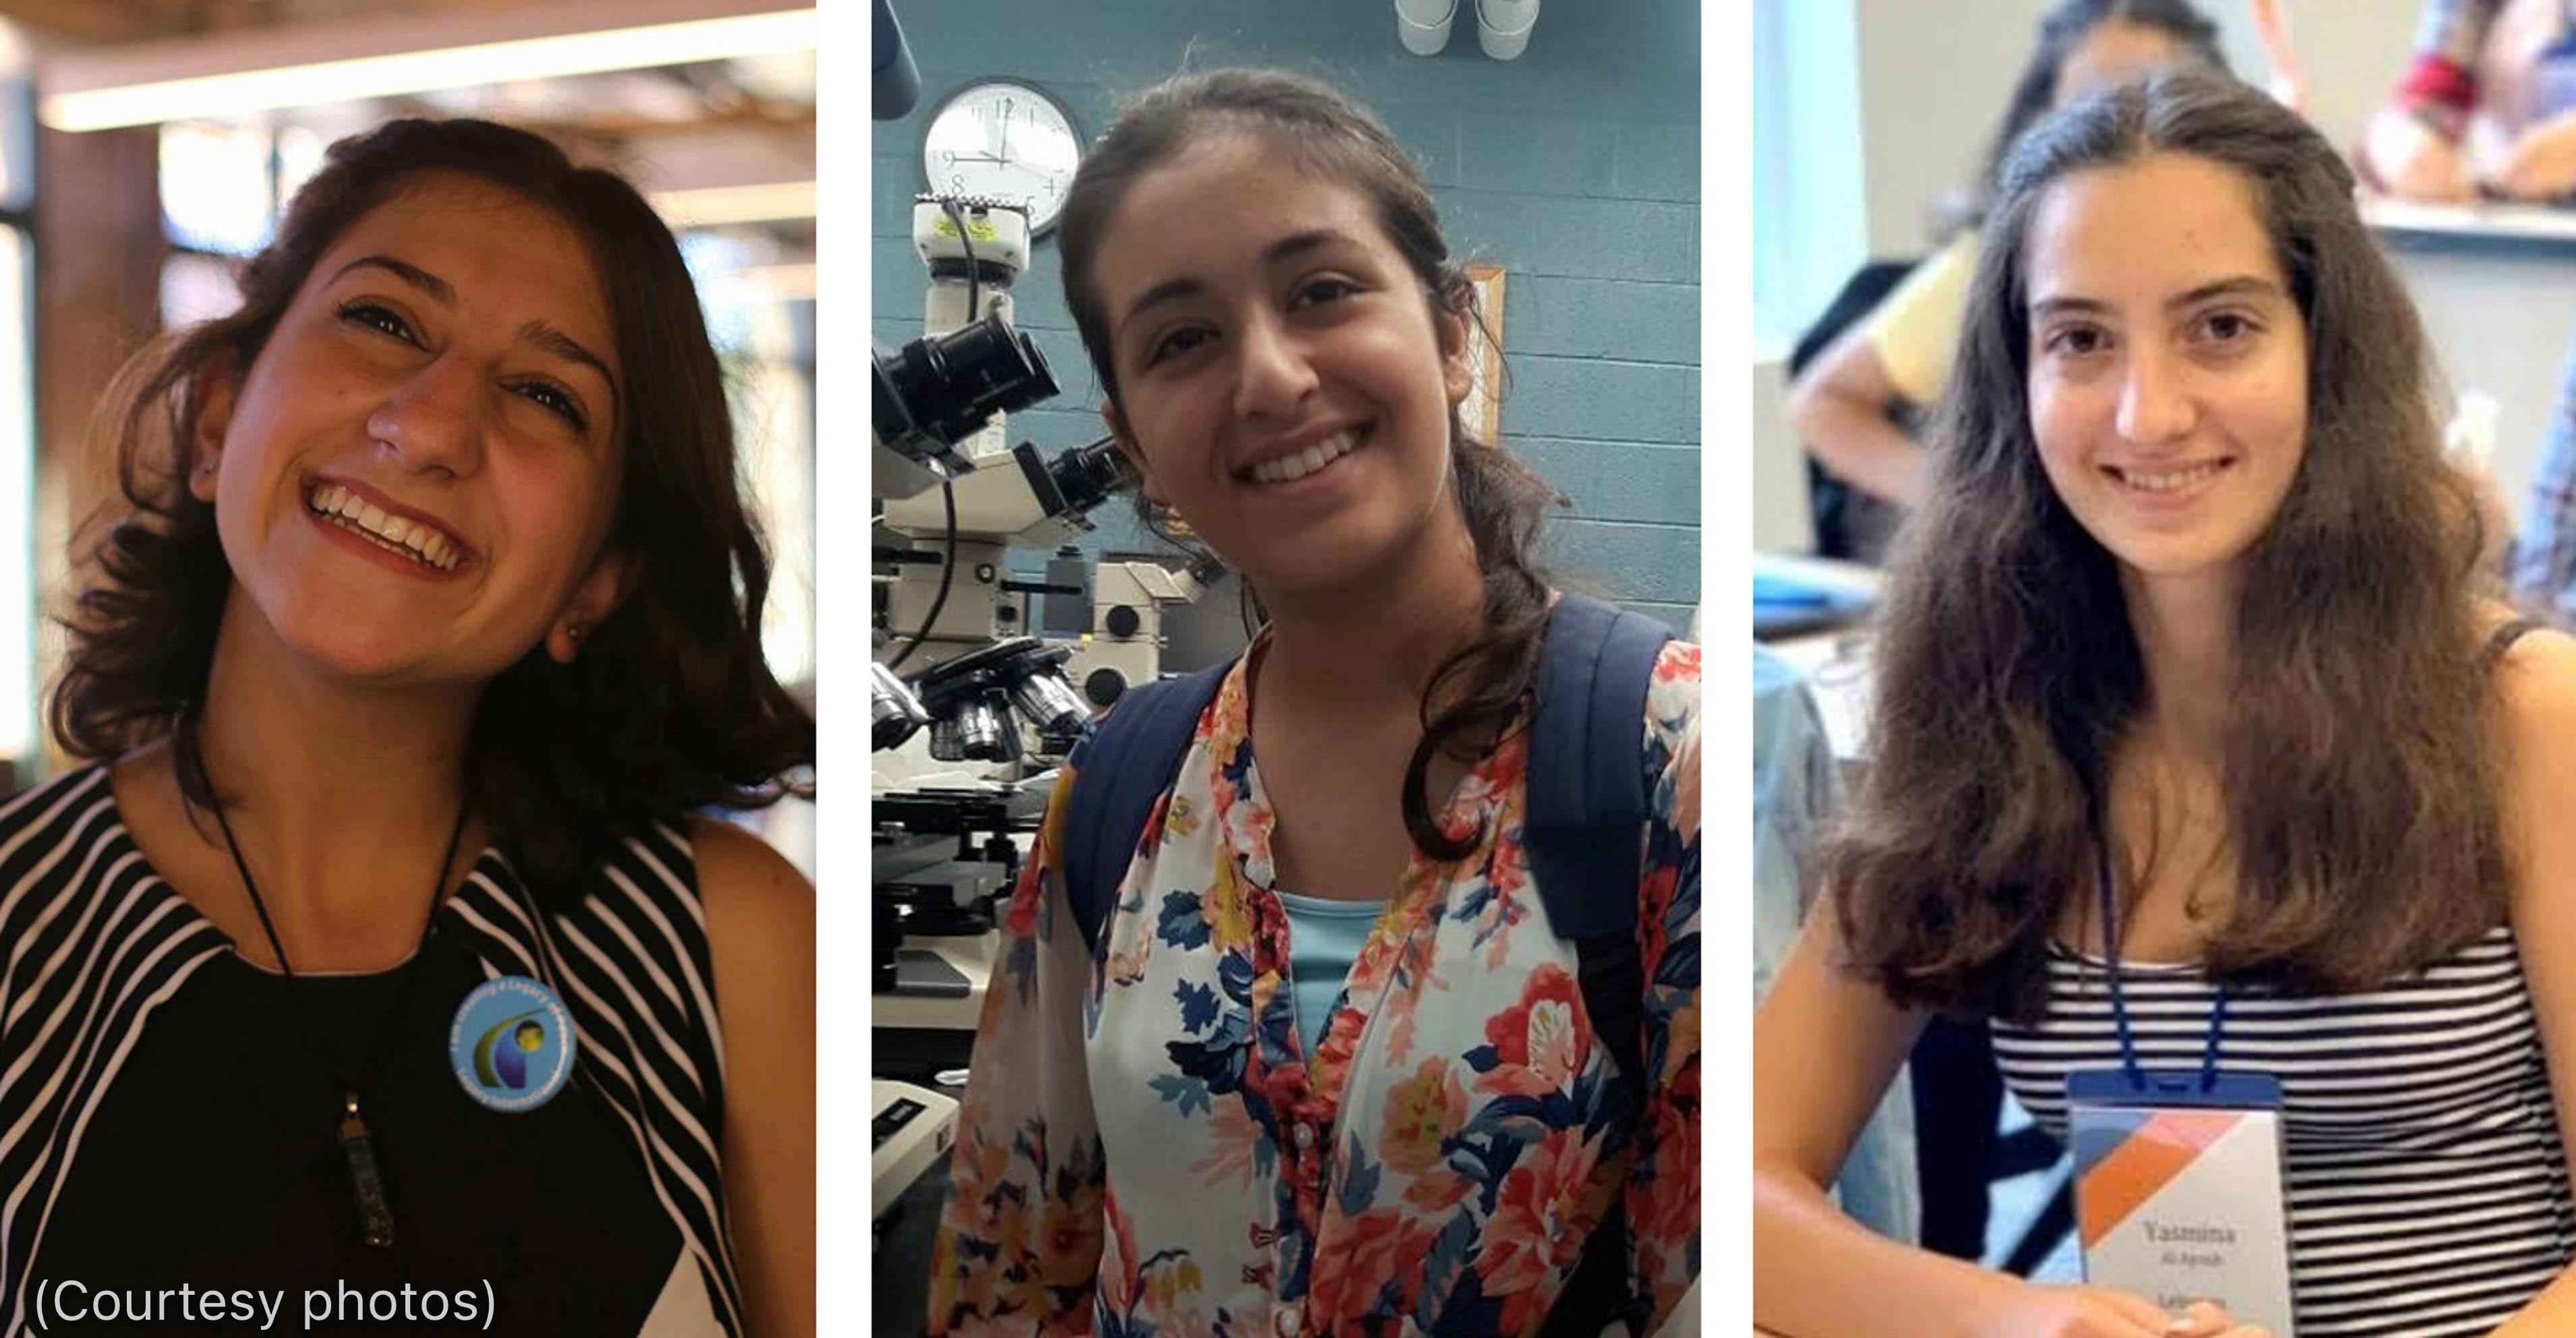 Trois photos de trois femmes souriantes (Photos offertes)